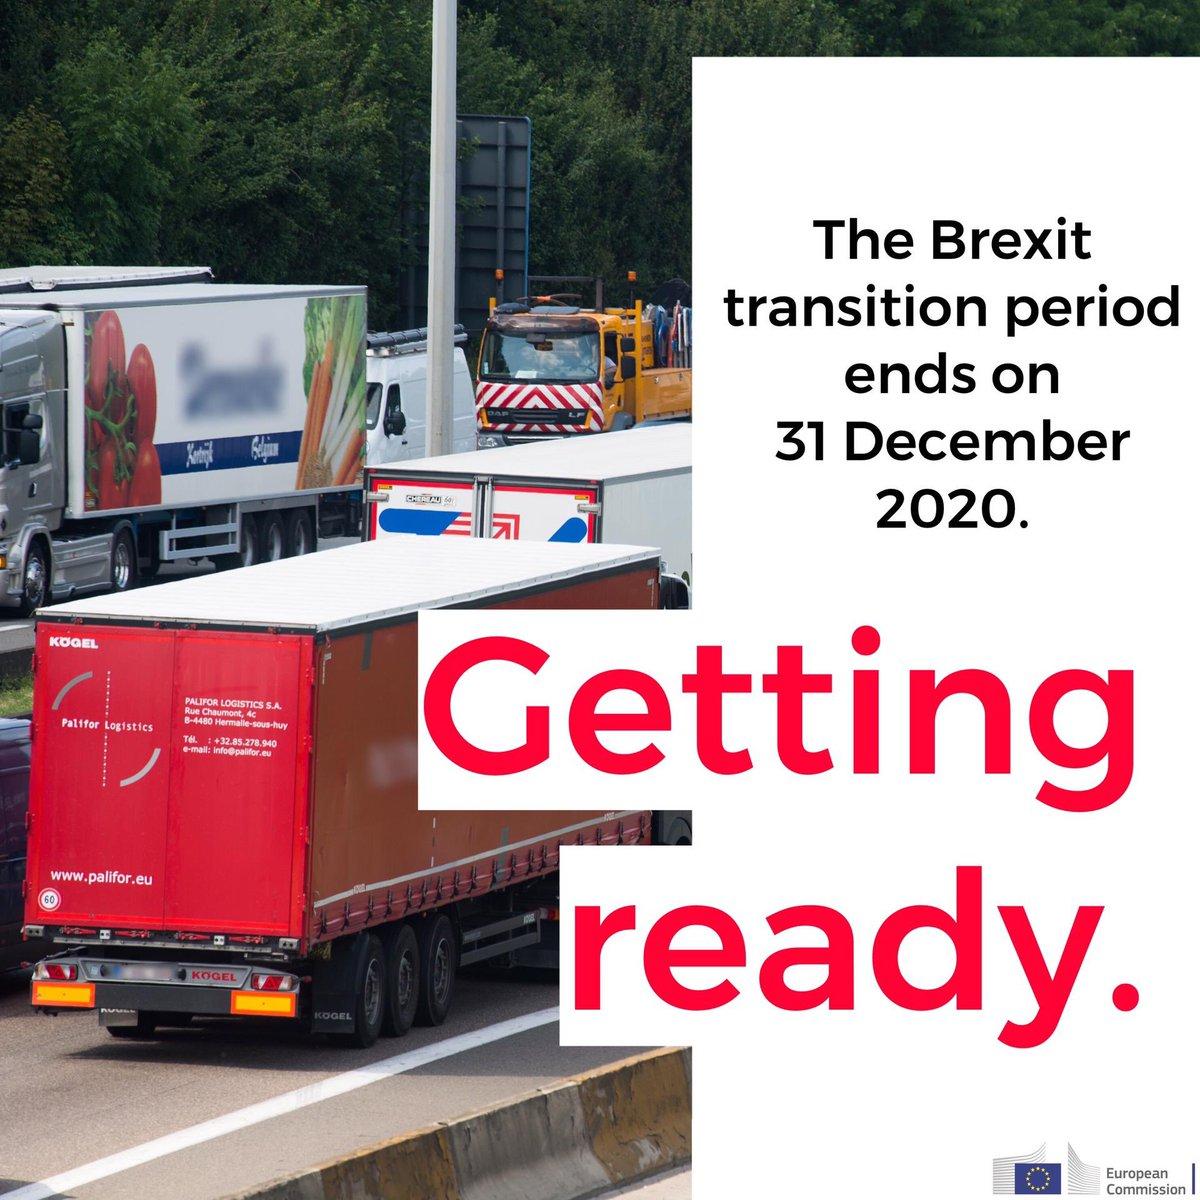 @MichelBarnier's photo on #Brexit